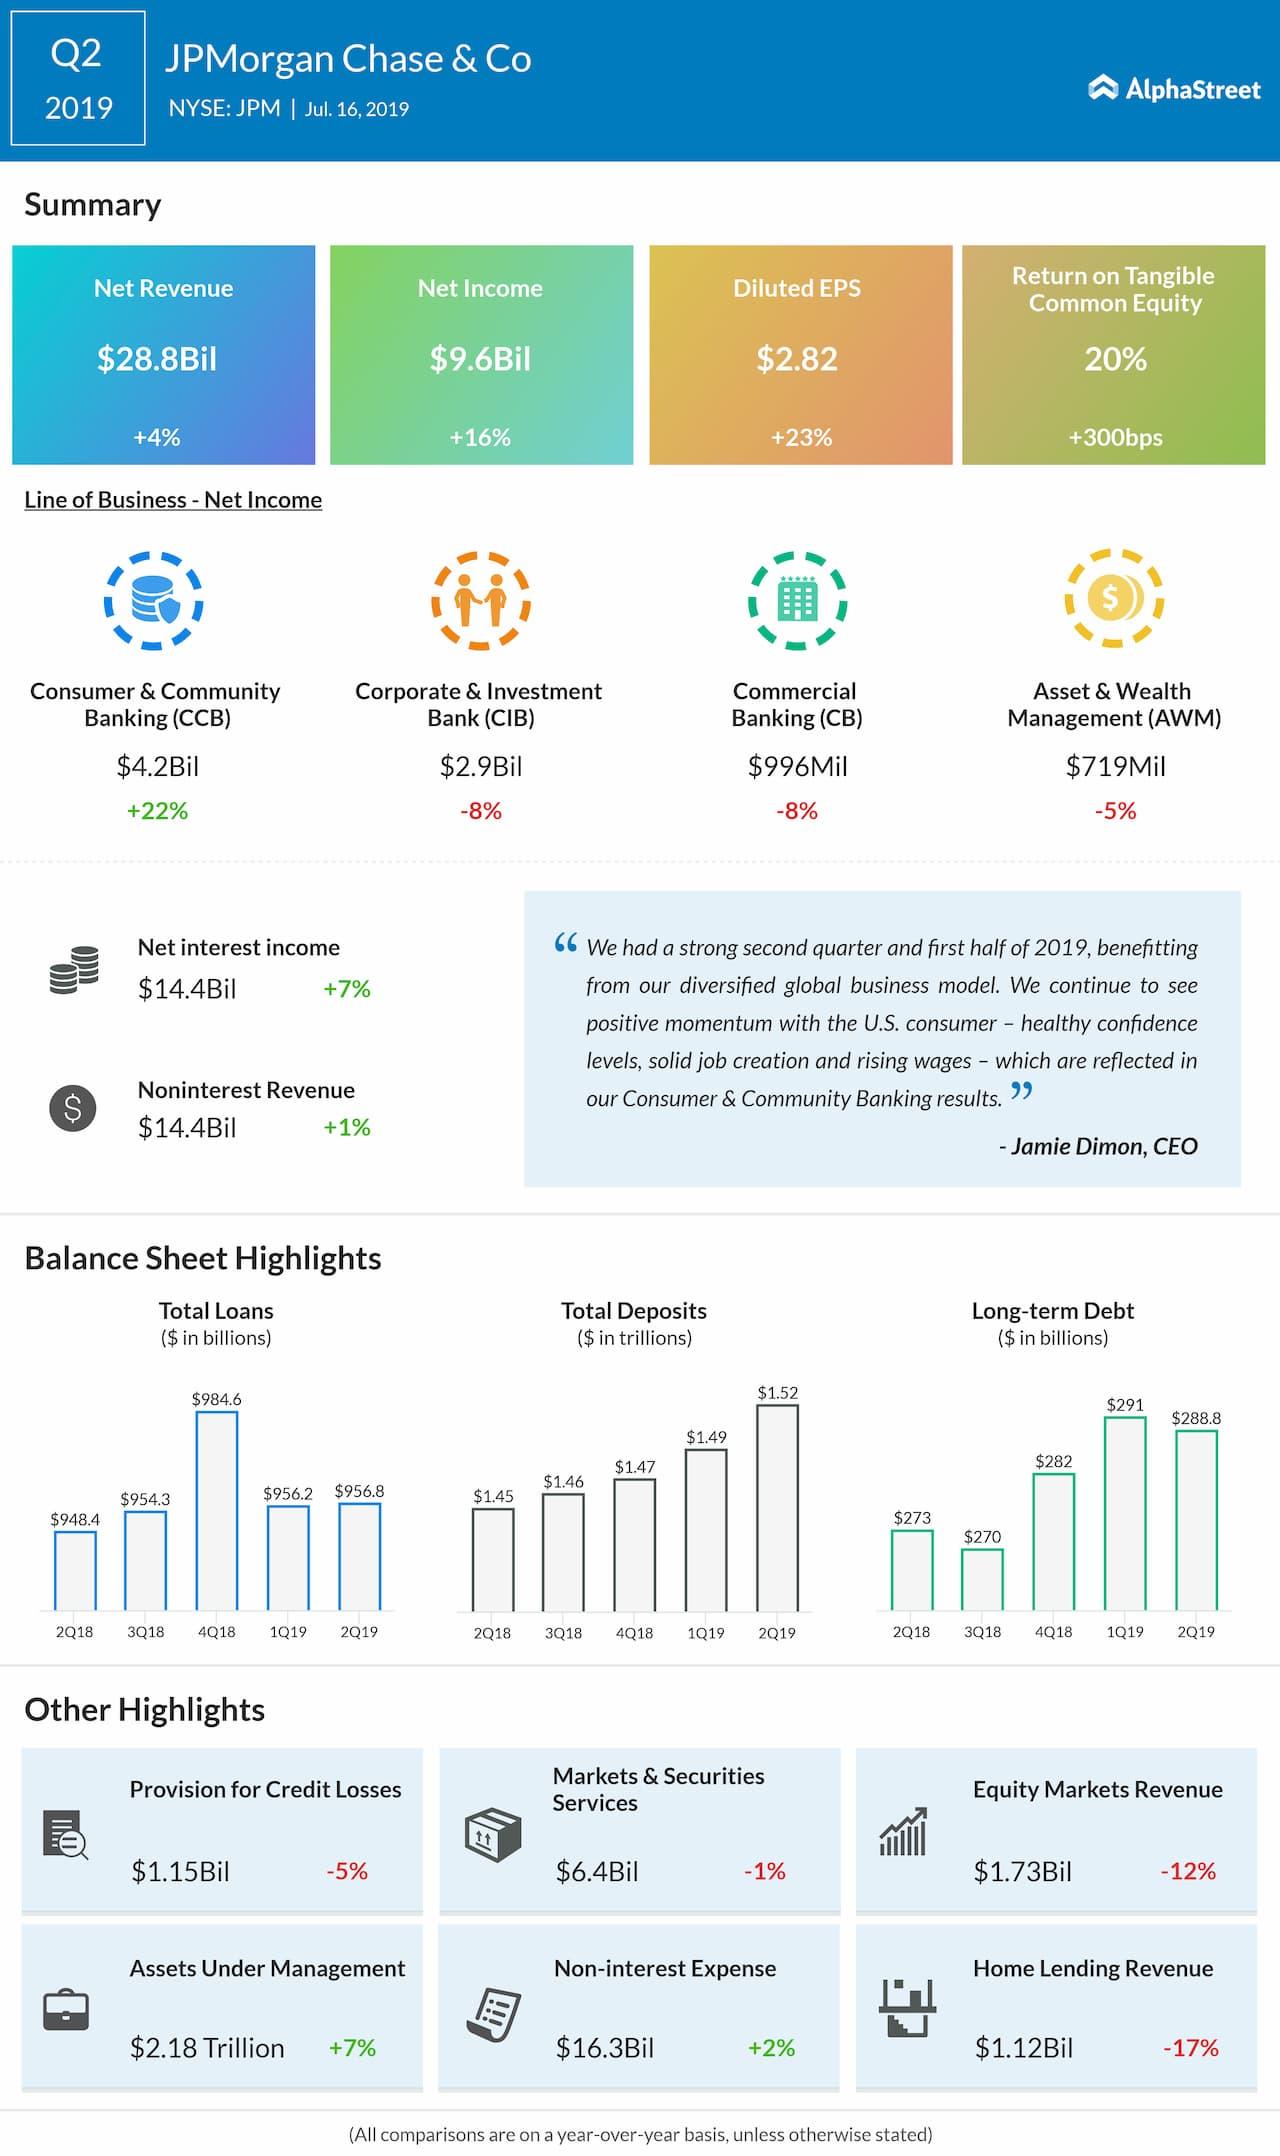 JPMorgan Chase (JPM) Q2 2019 earnings results | AlphaStreet